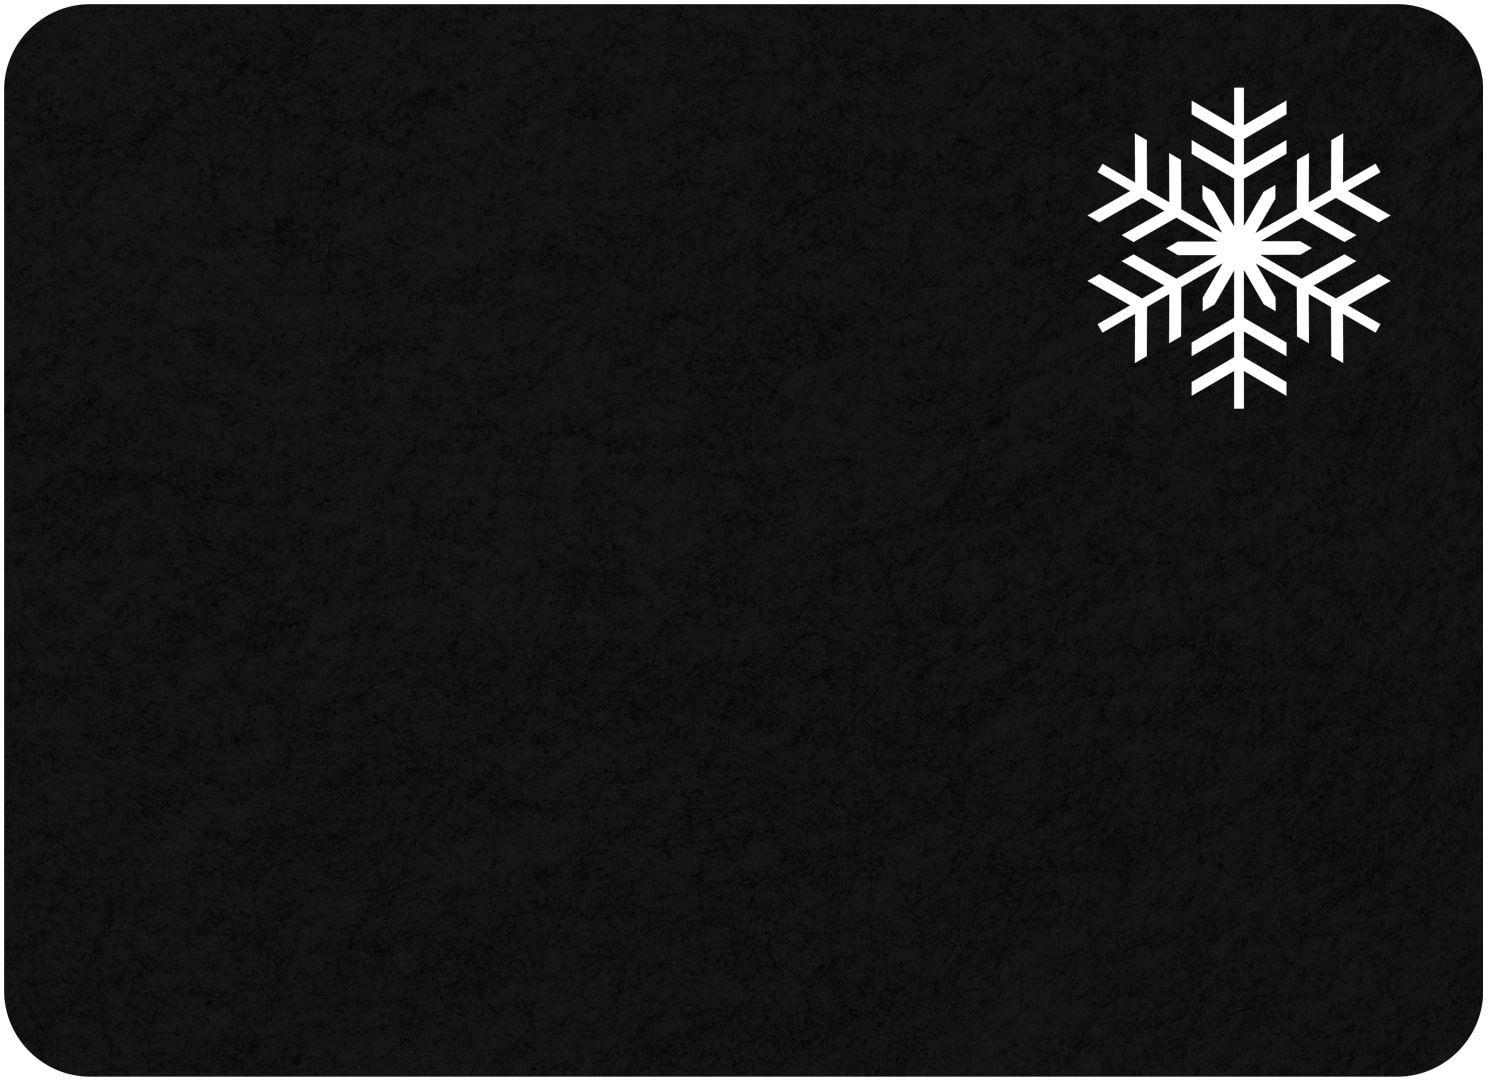 Podkładka pod talerz - Śnieżynka - 40 cm - 1 szt.